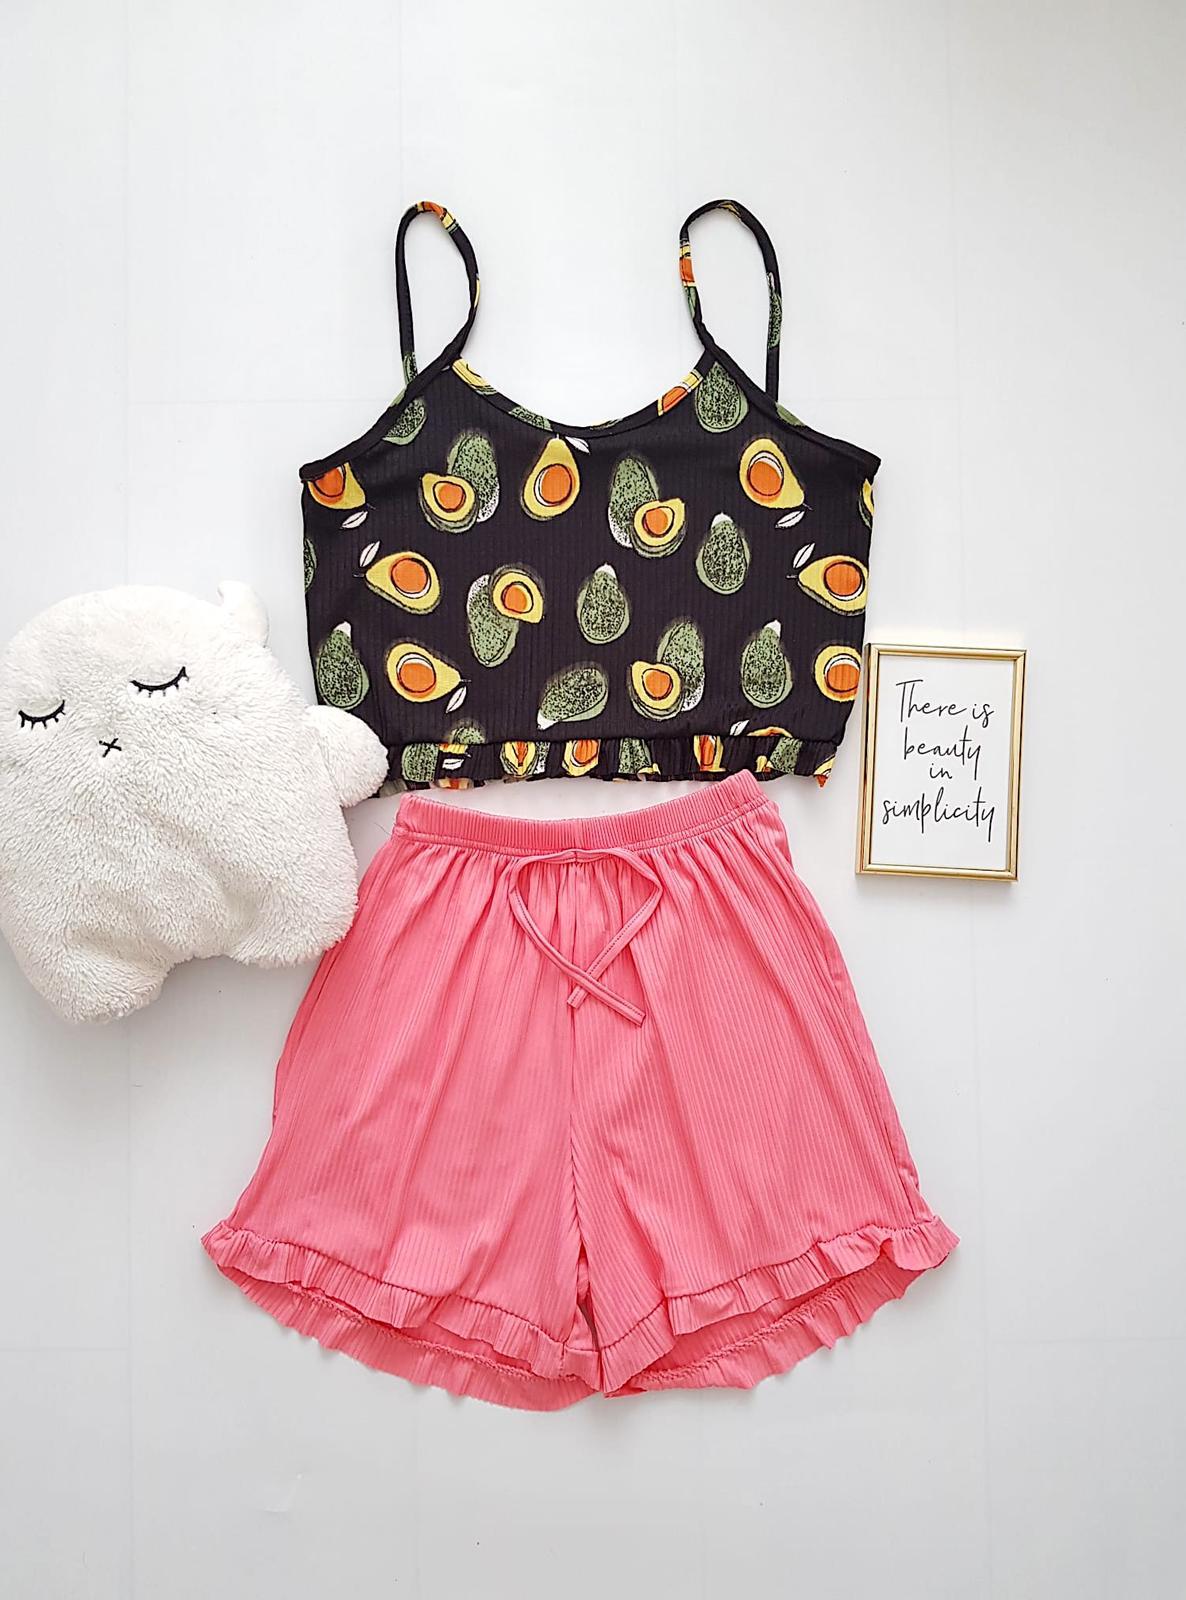 Pijama dama ieftina scurta cu maieu cu volanase Combo avocado negru + roz